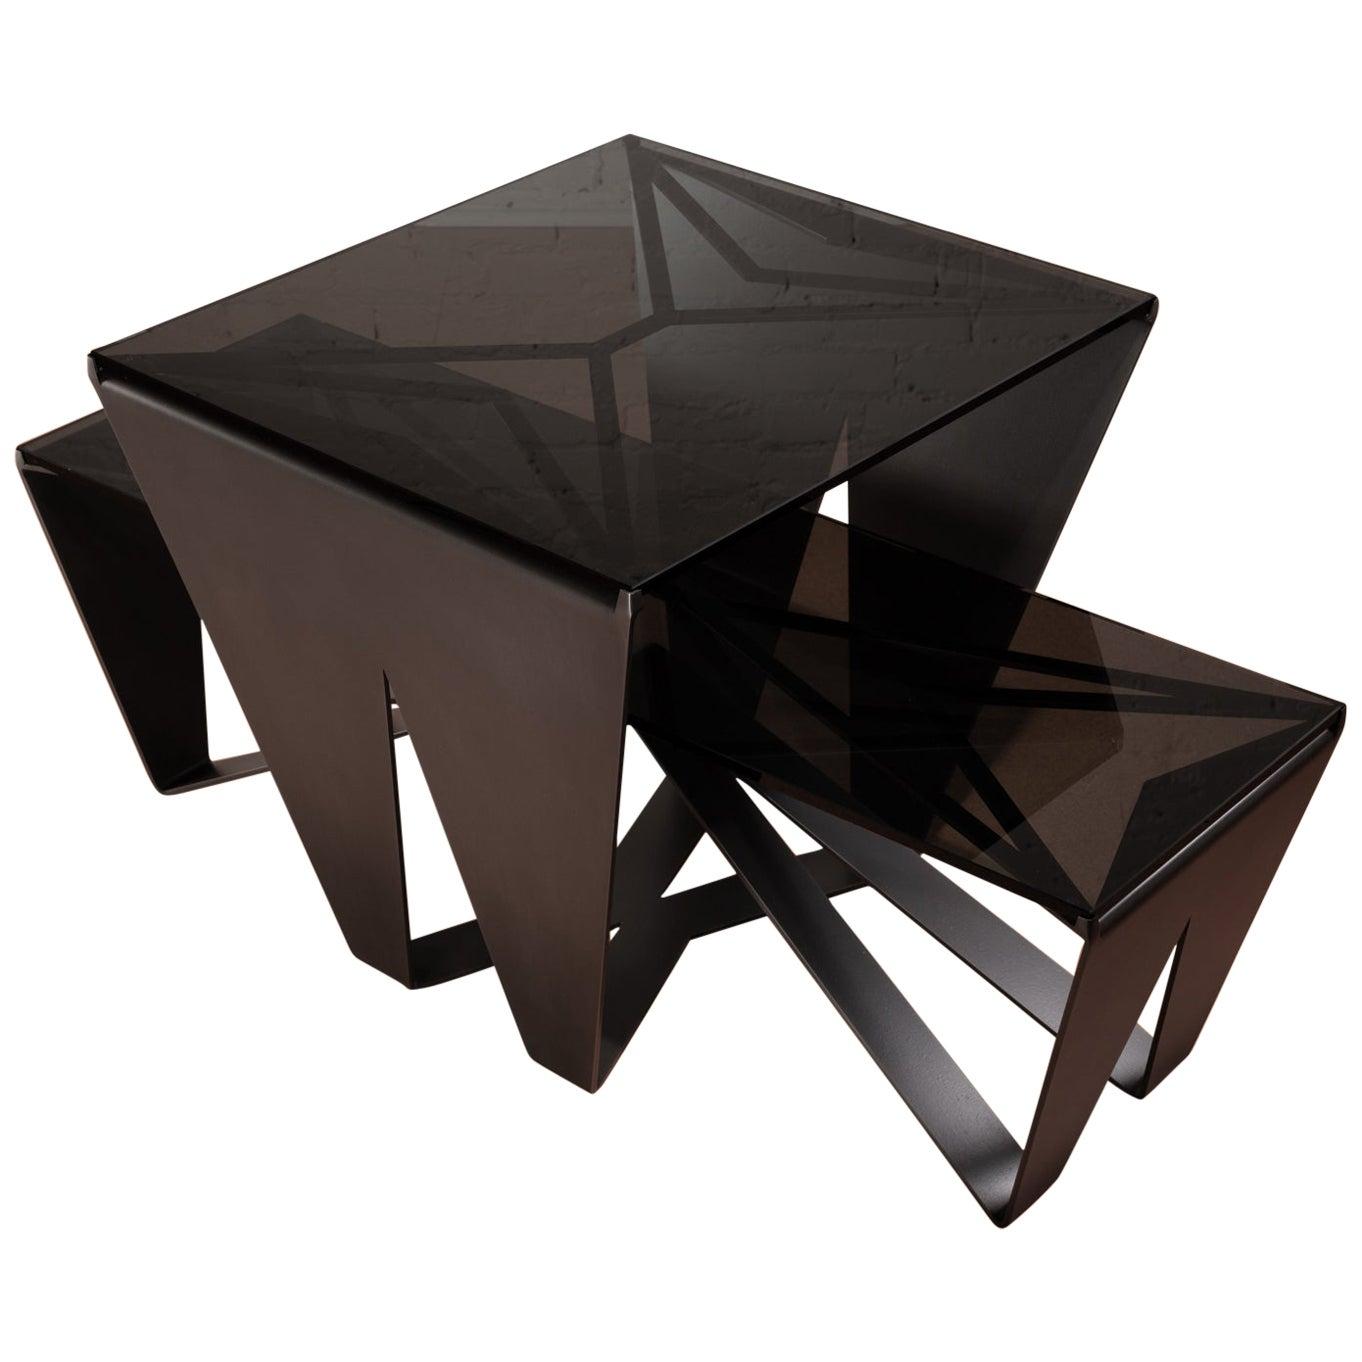 Nesting Coffee Tables, Blackened Steel, Gray Glass, Geometric, Force/Collide